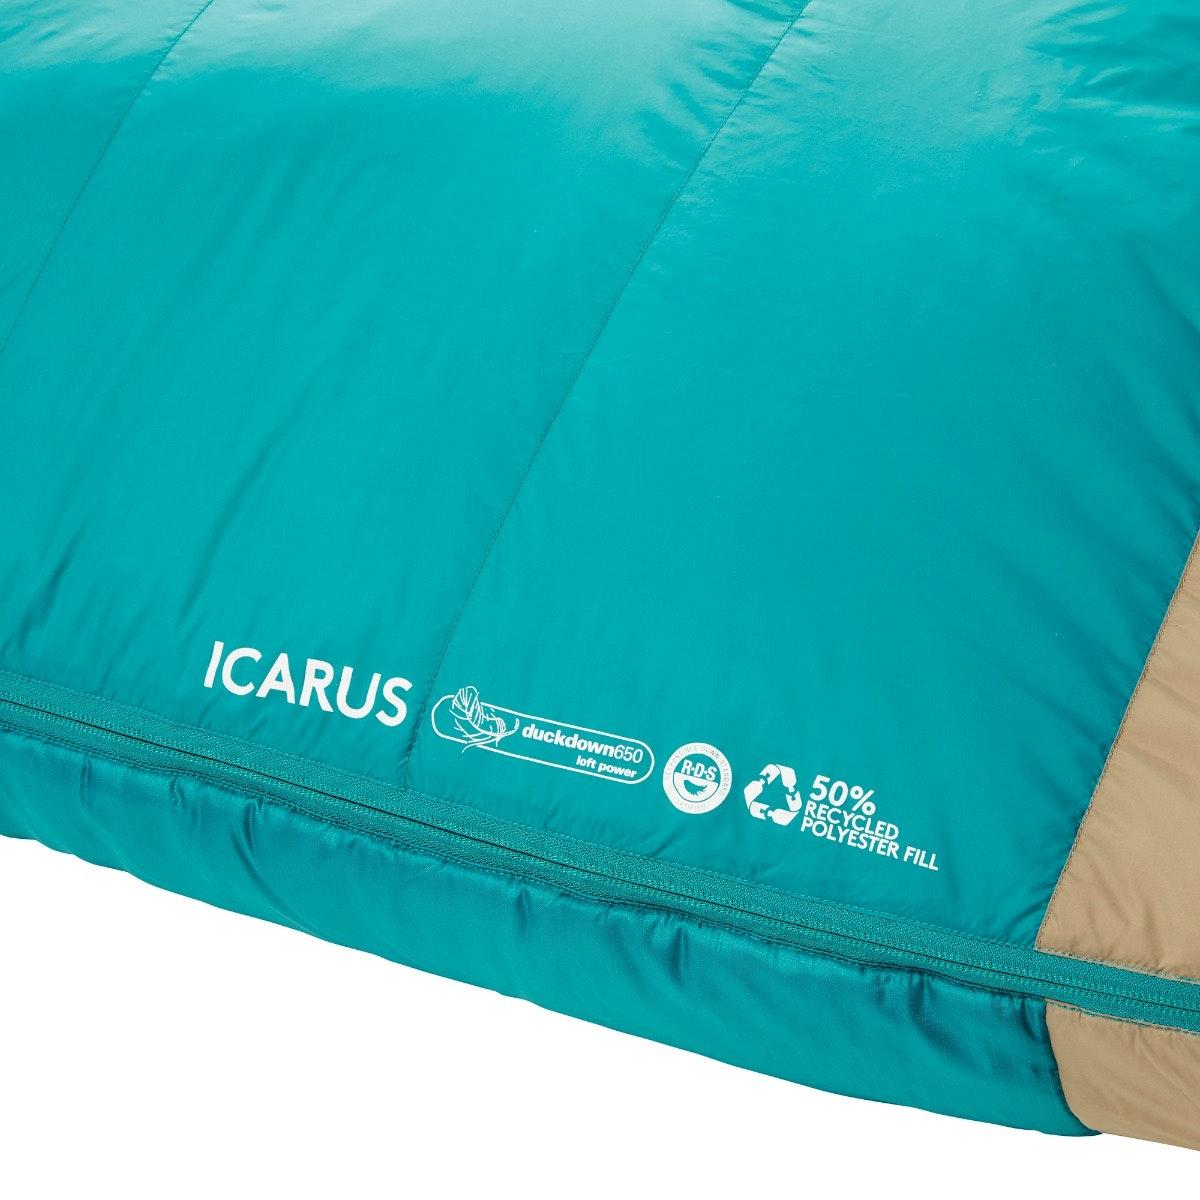 NEW-Kathmandu-Icarus-Hybrid-Sleeping-Bag thumbnail 6